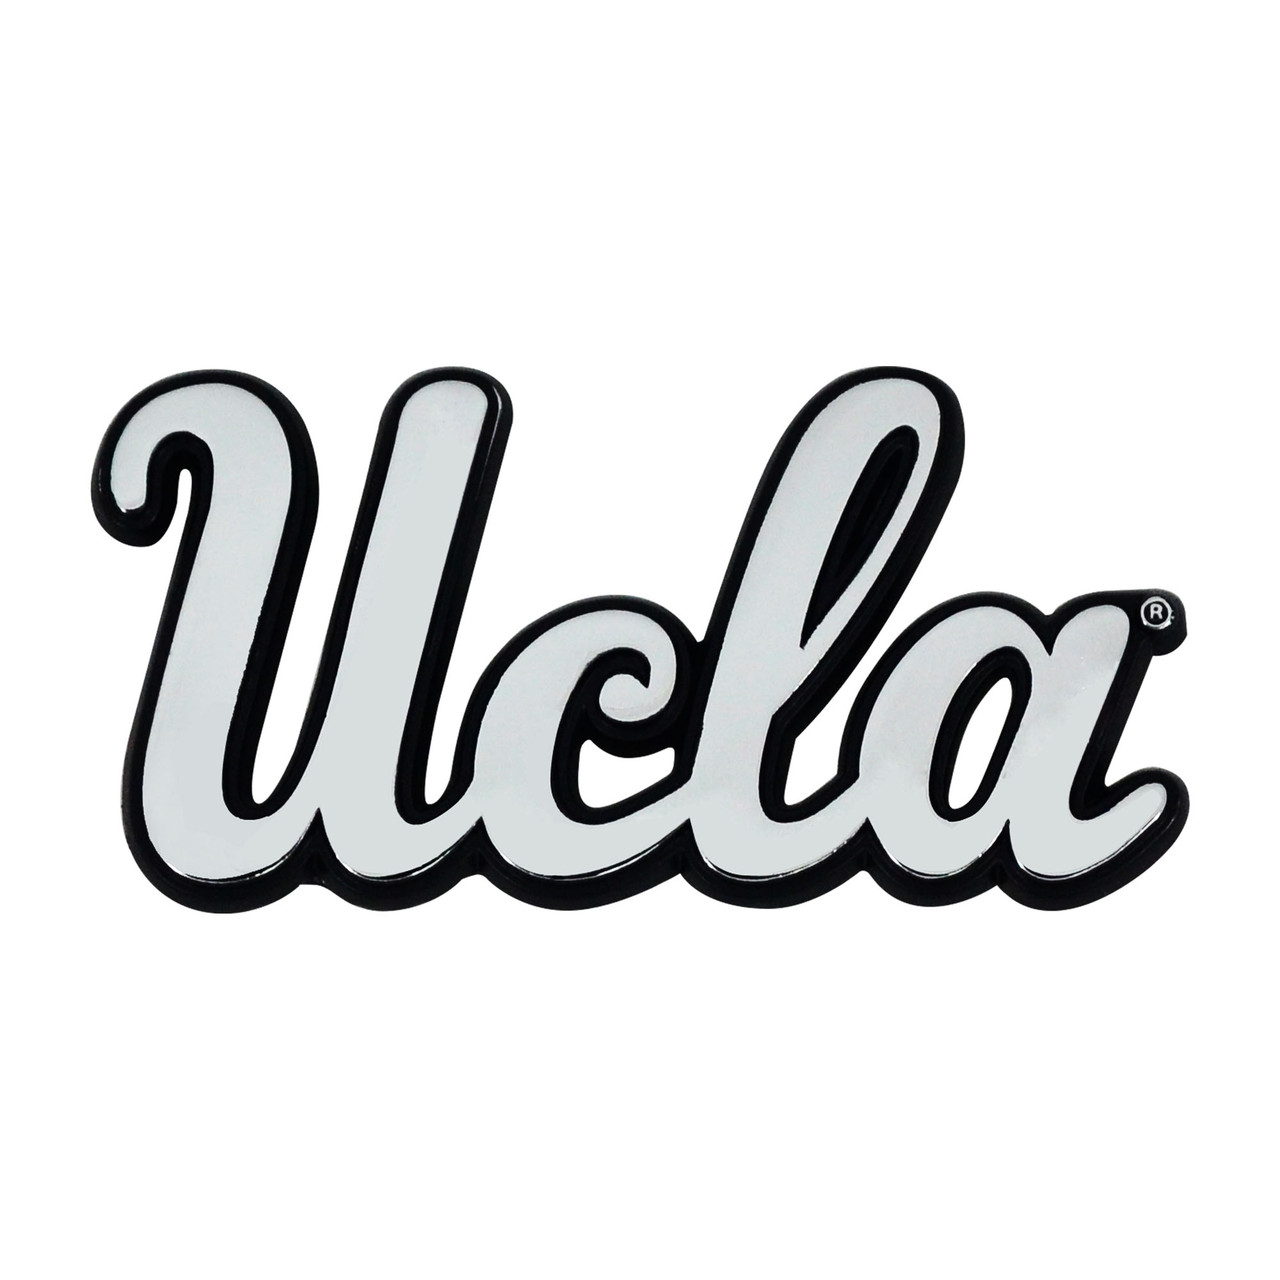 UCLA Bruins Auto Emblem Premium Metal Chrome Special Order